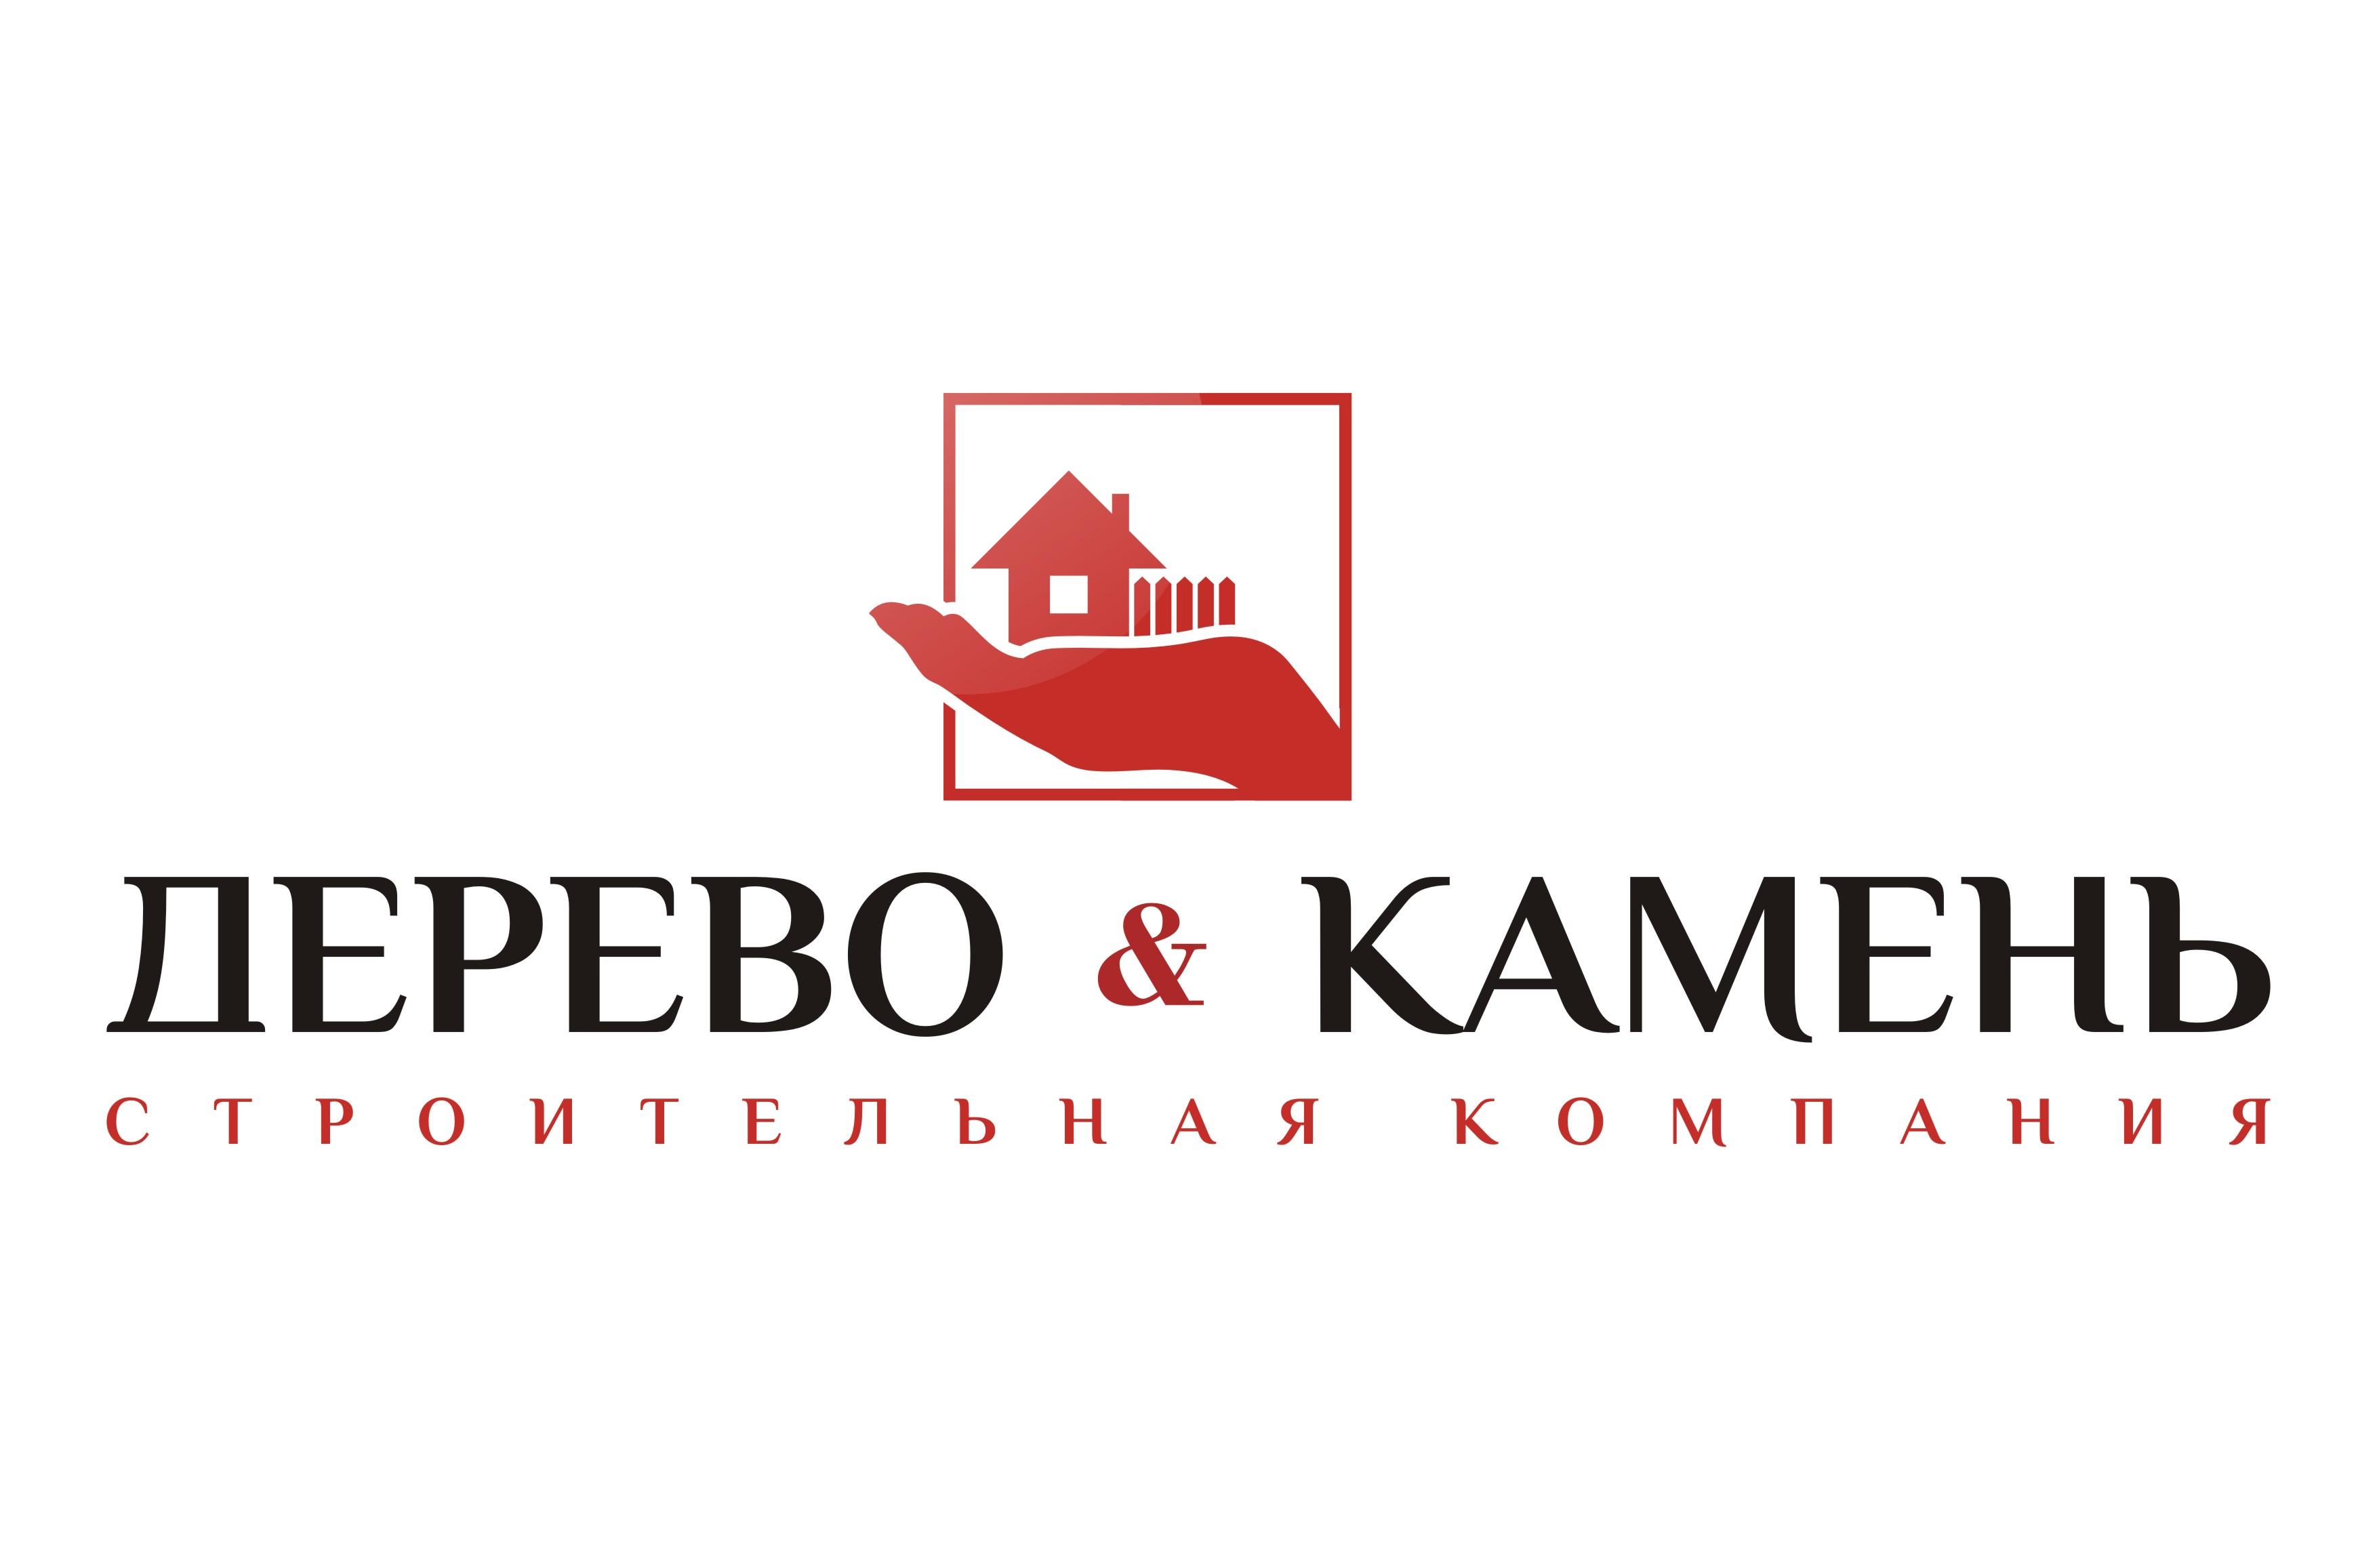 Логотип и Фирменный стиль фото f_35254a645301b4b2.jpg